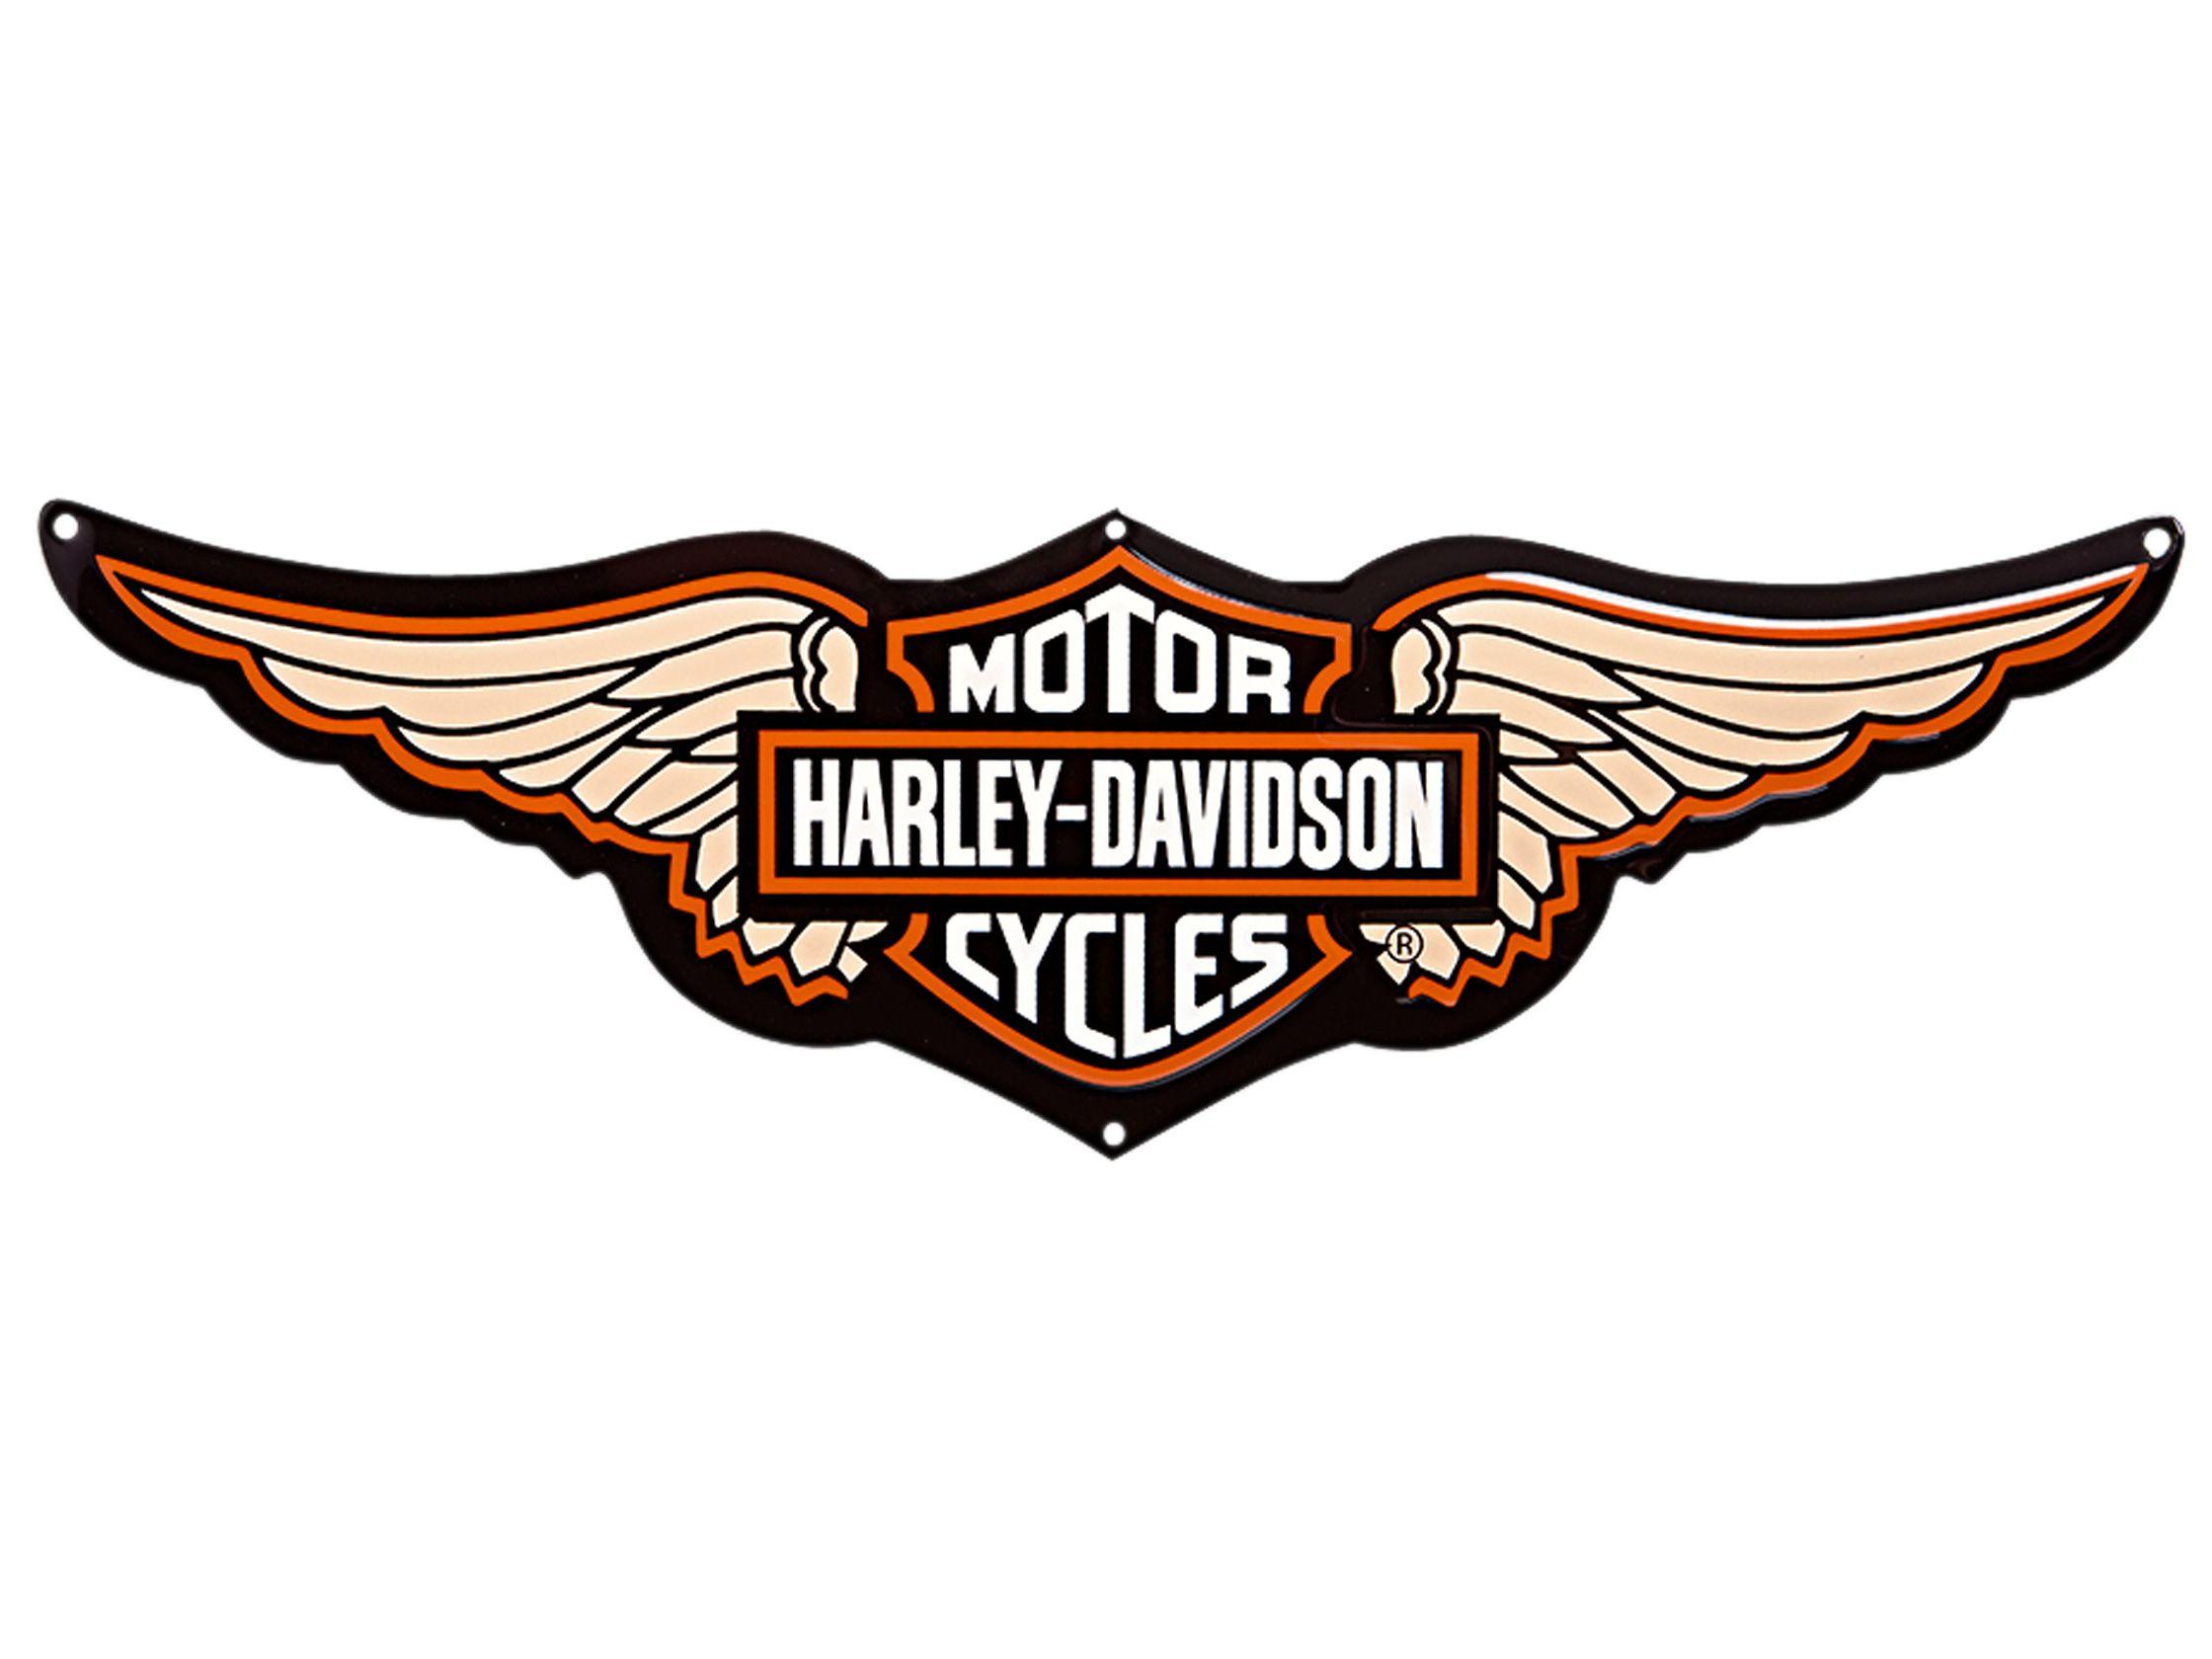 harley davidson logo images wallpaper hd 3444 wallpaper rh pinterest ca harley davidson logo pictures harley davidson emblem pictures